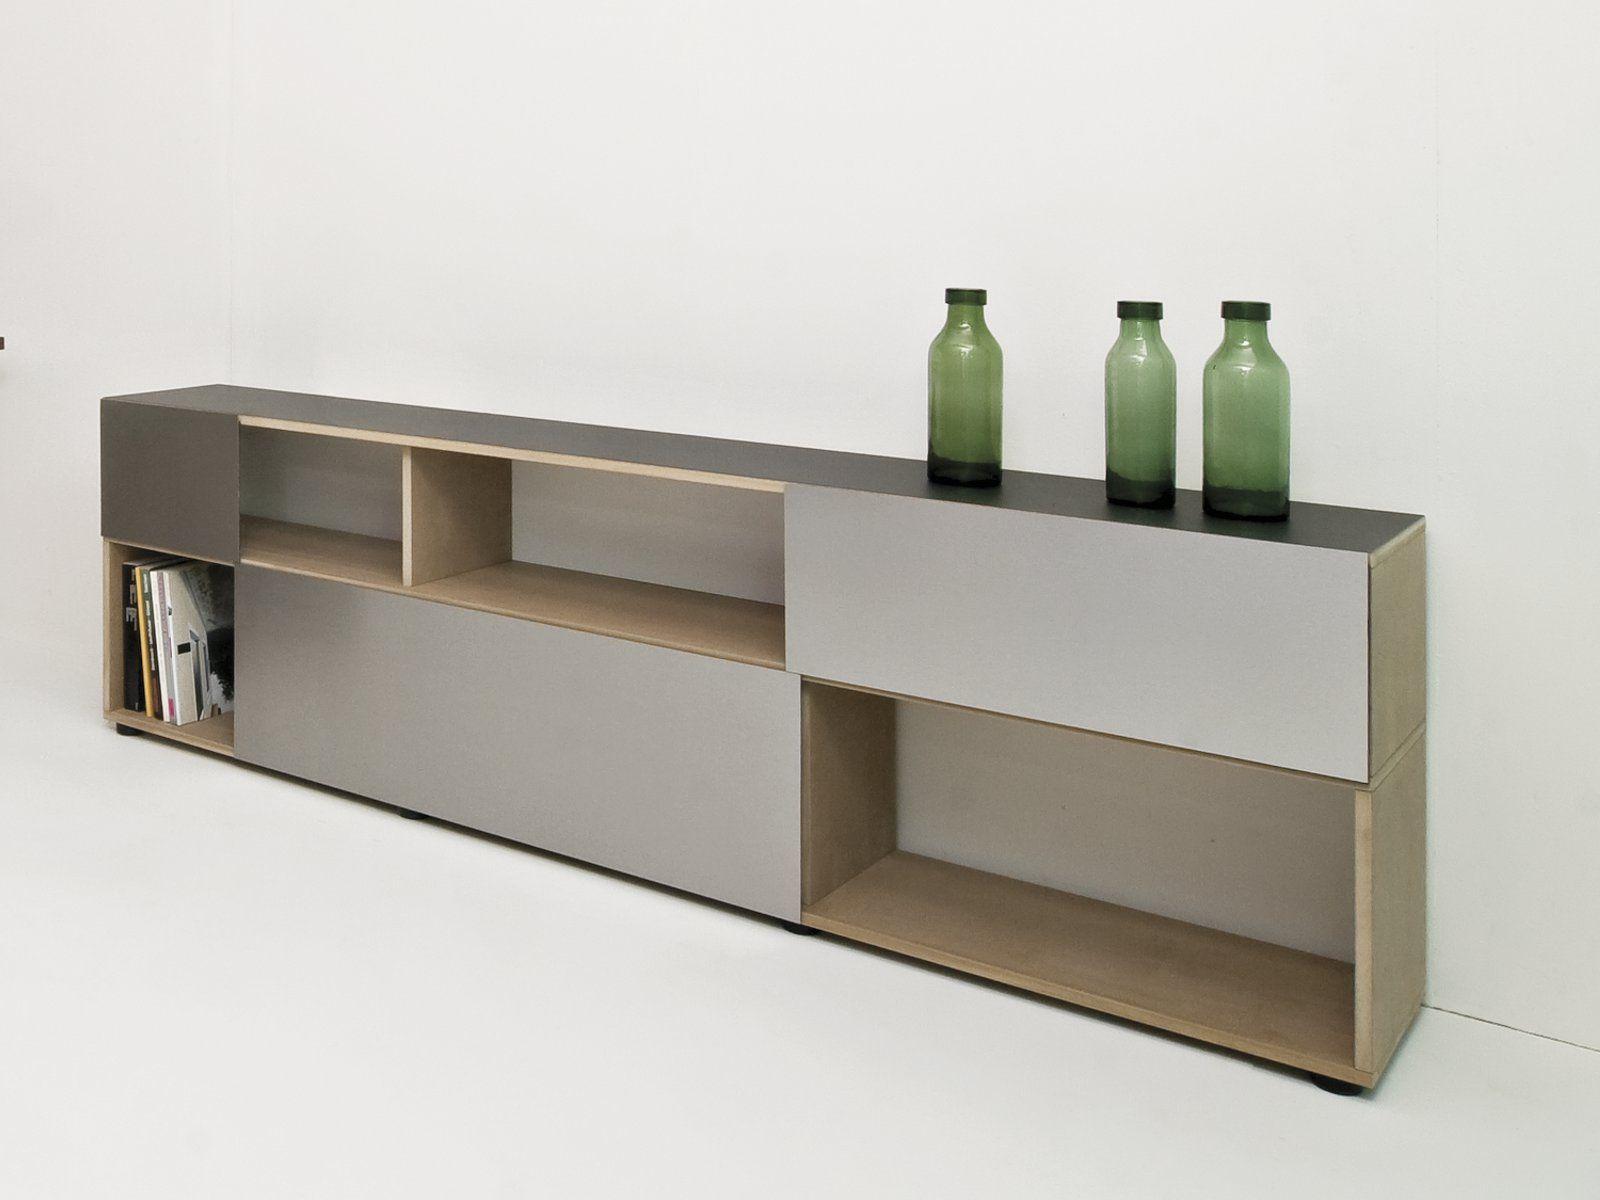 Madia Con Ante Scorrevoli ANALOG By Sanktjohanser Design Matthias  #8E723D 1600 1200 Mobiletti Da Cucina Leroy Merlin